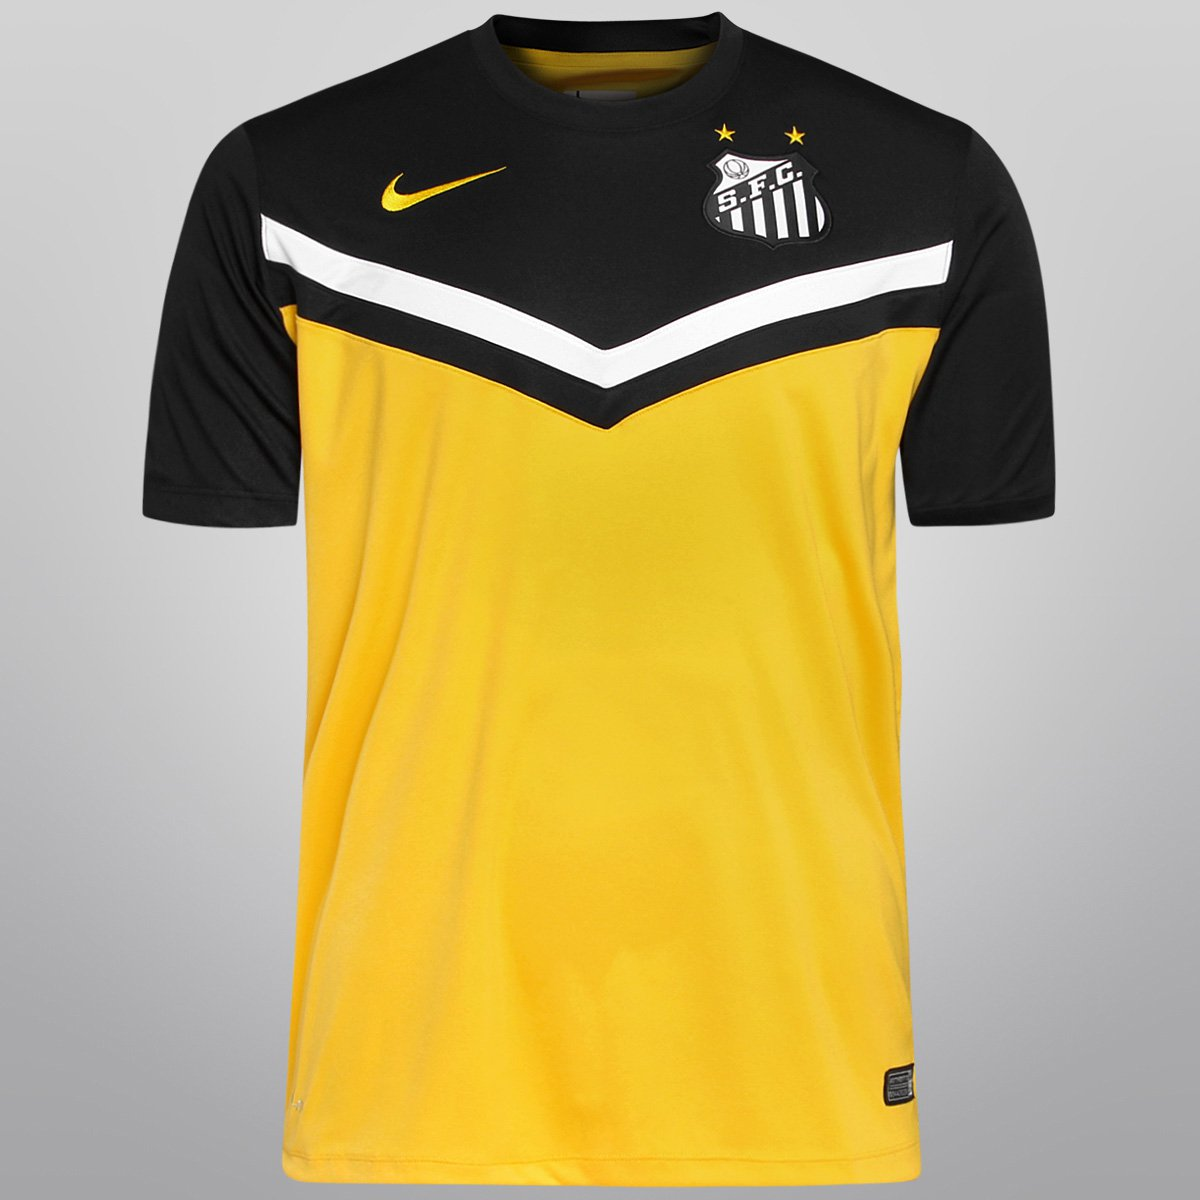 Camisa Nike Santos III 2014 s nº - Compre Agora  e4d55a471aa69